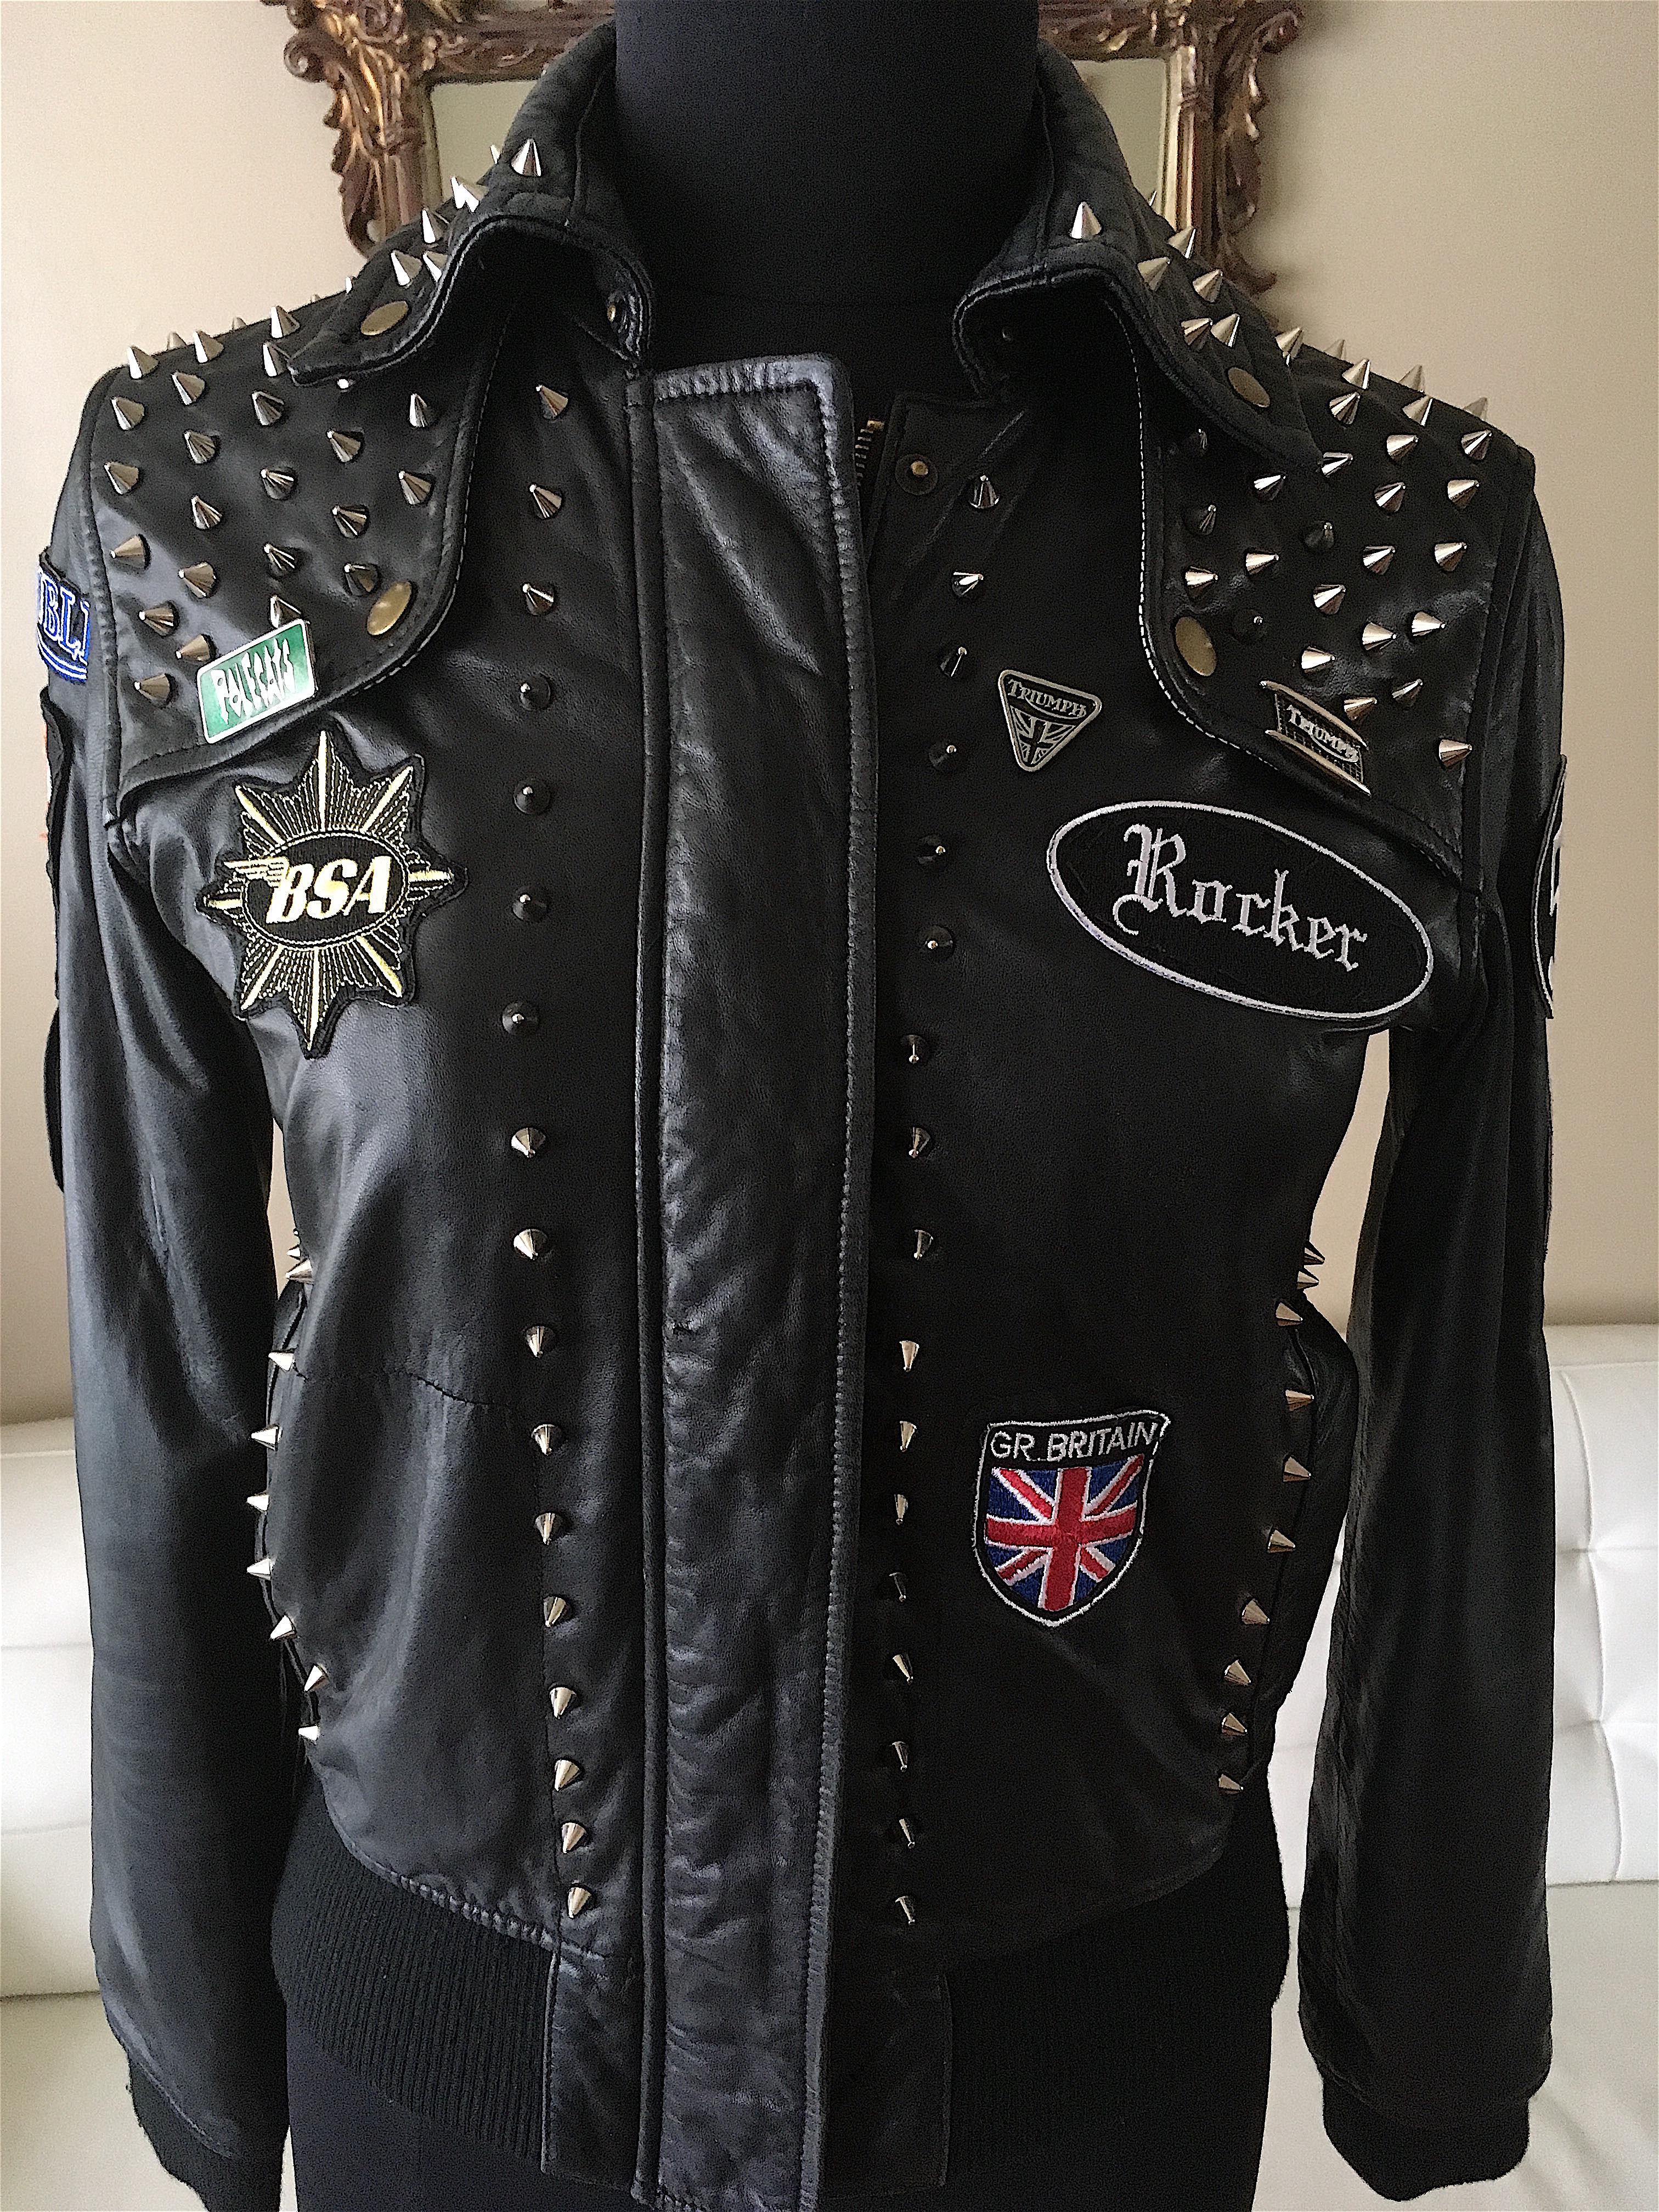 Rockerjacket